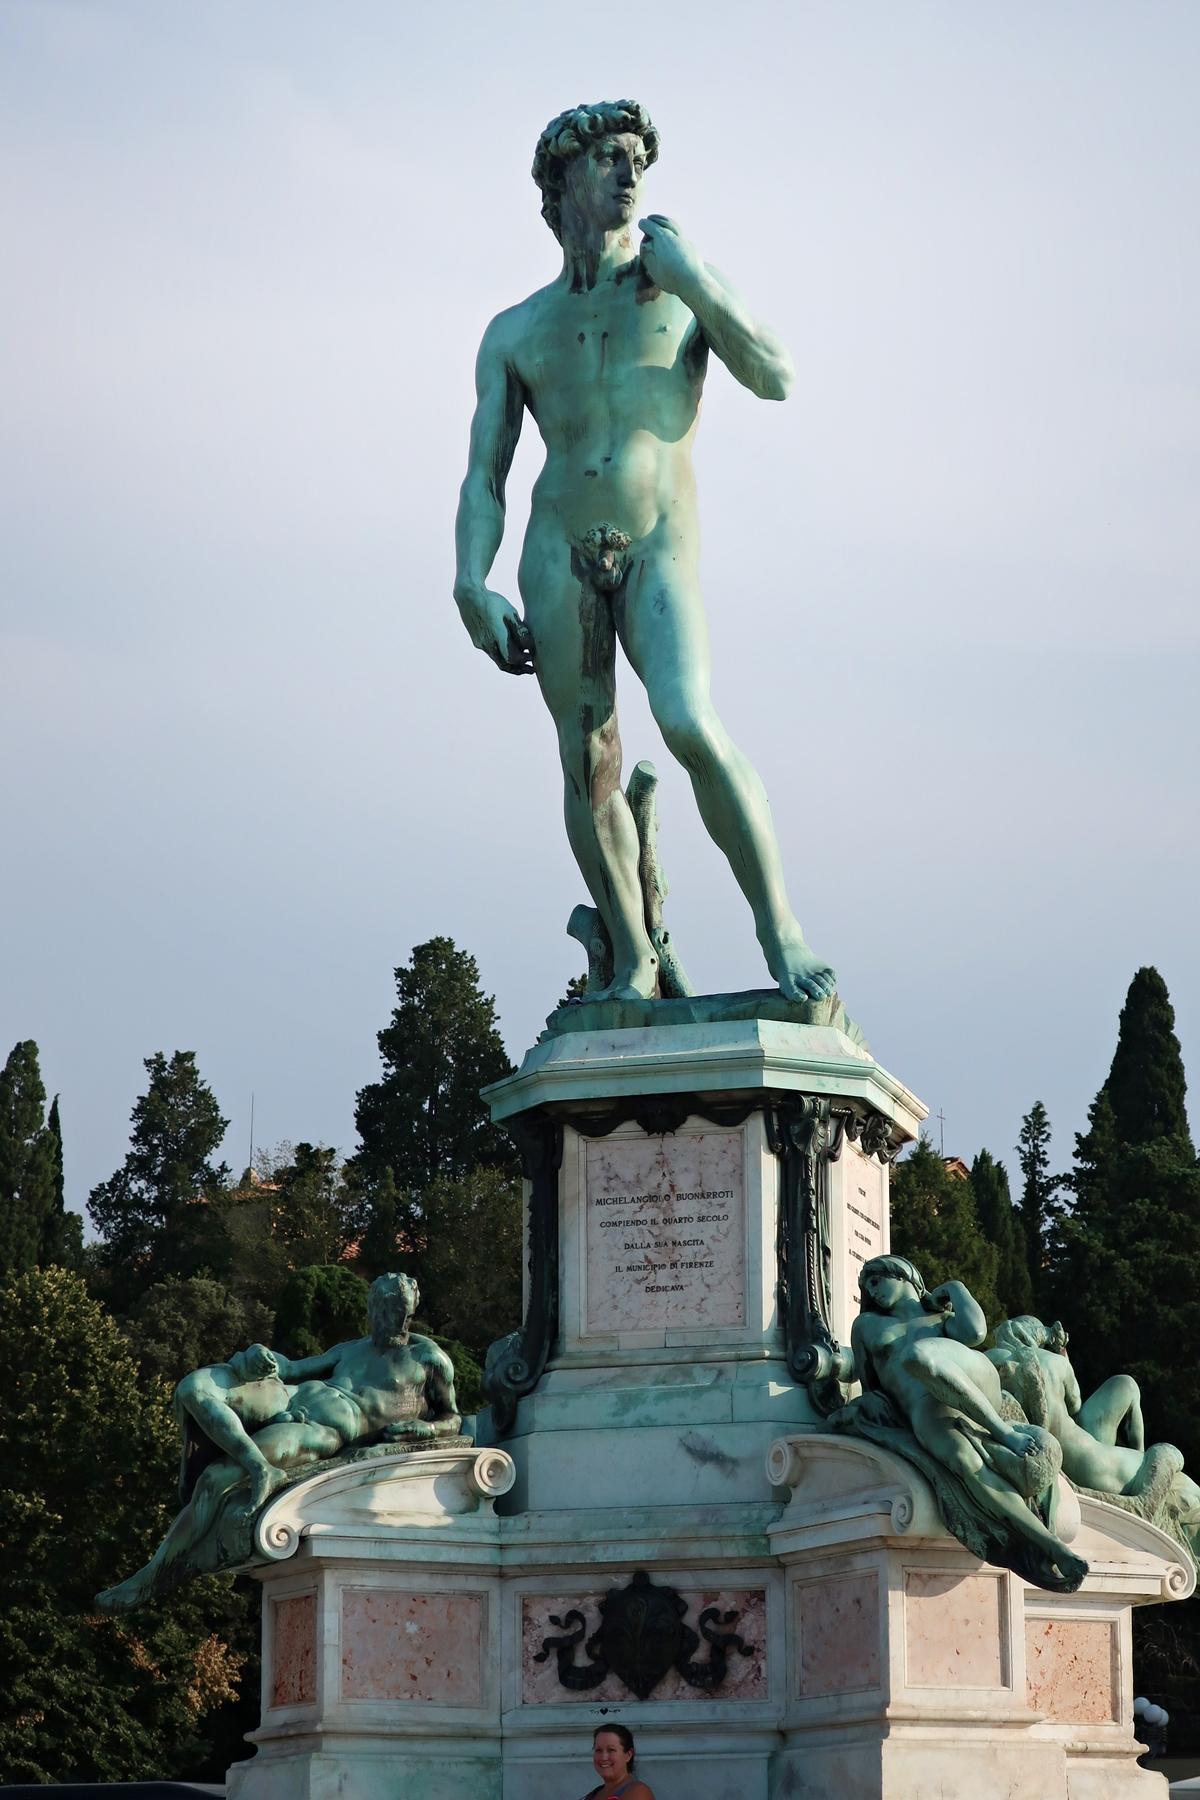 IMG_1275(Firenze_Michelangero_park_David).jpg